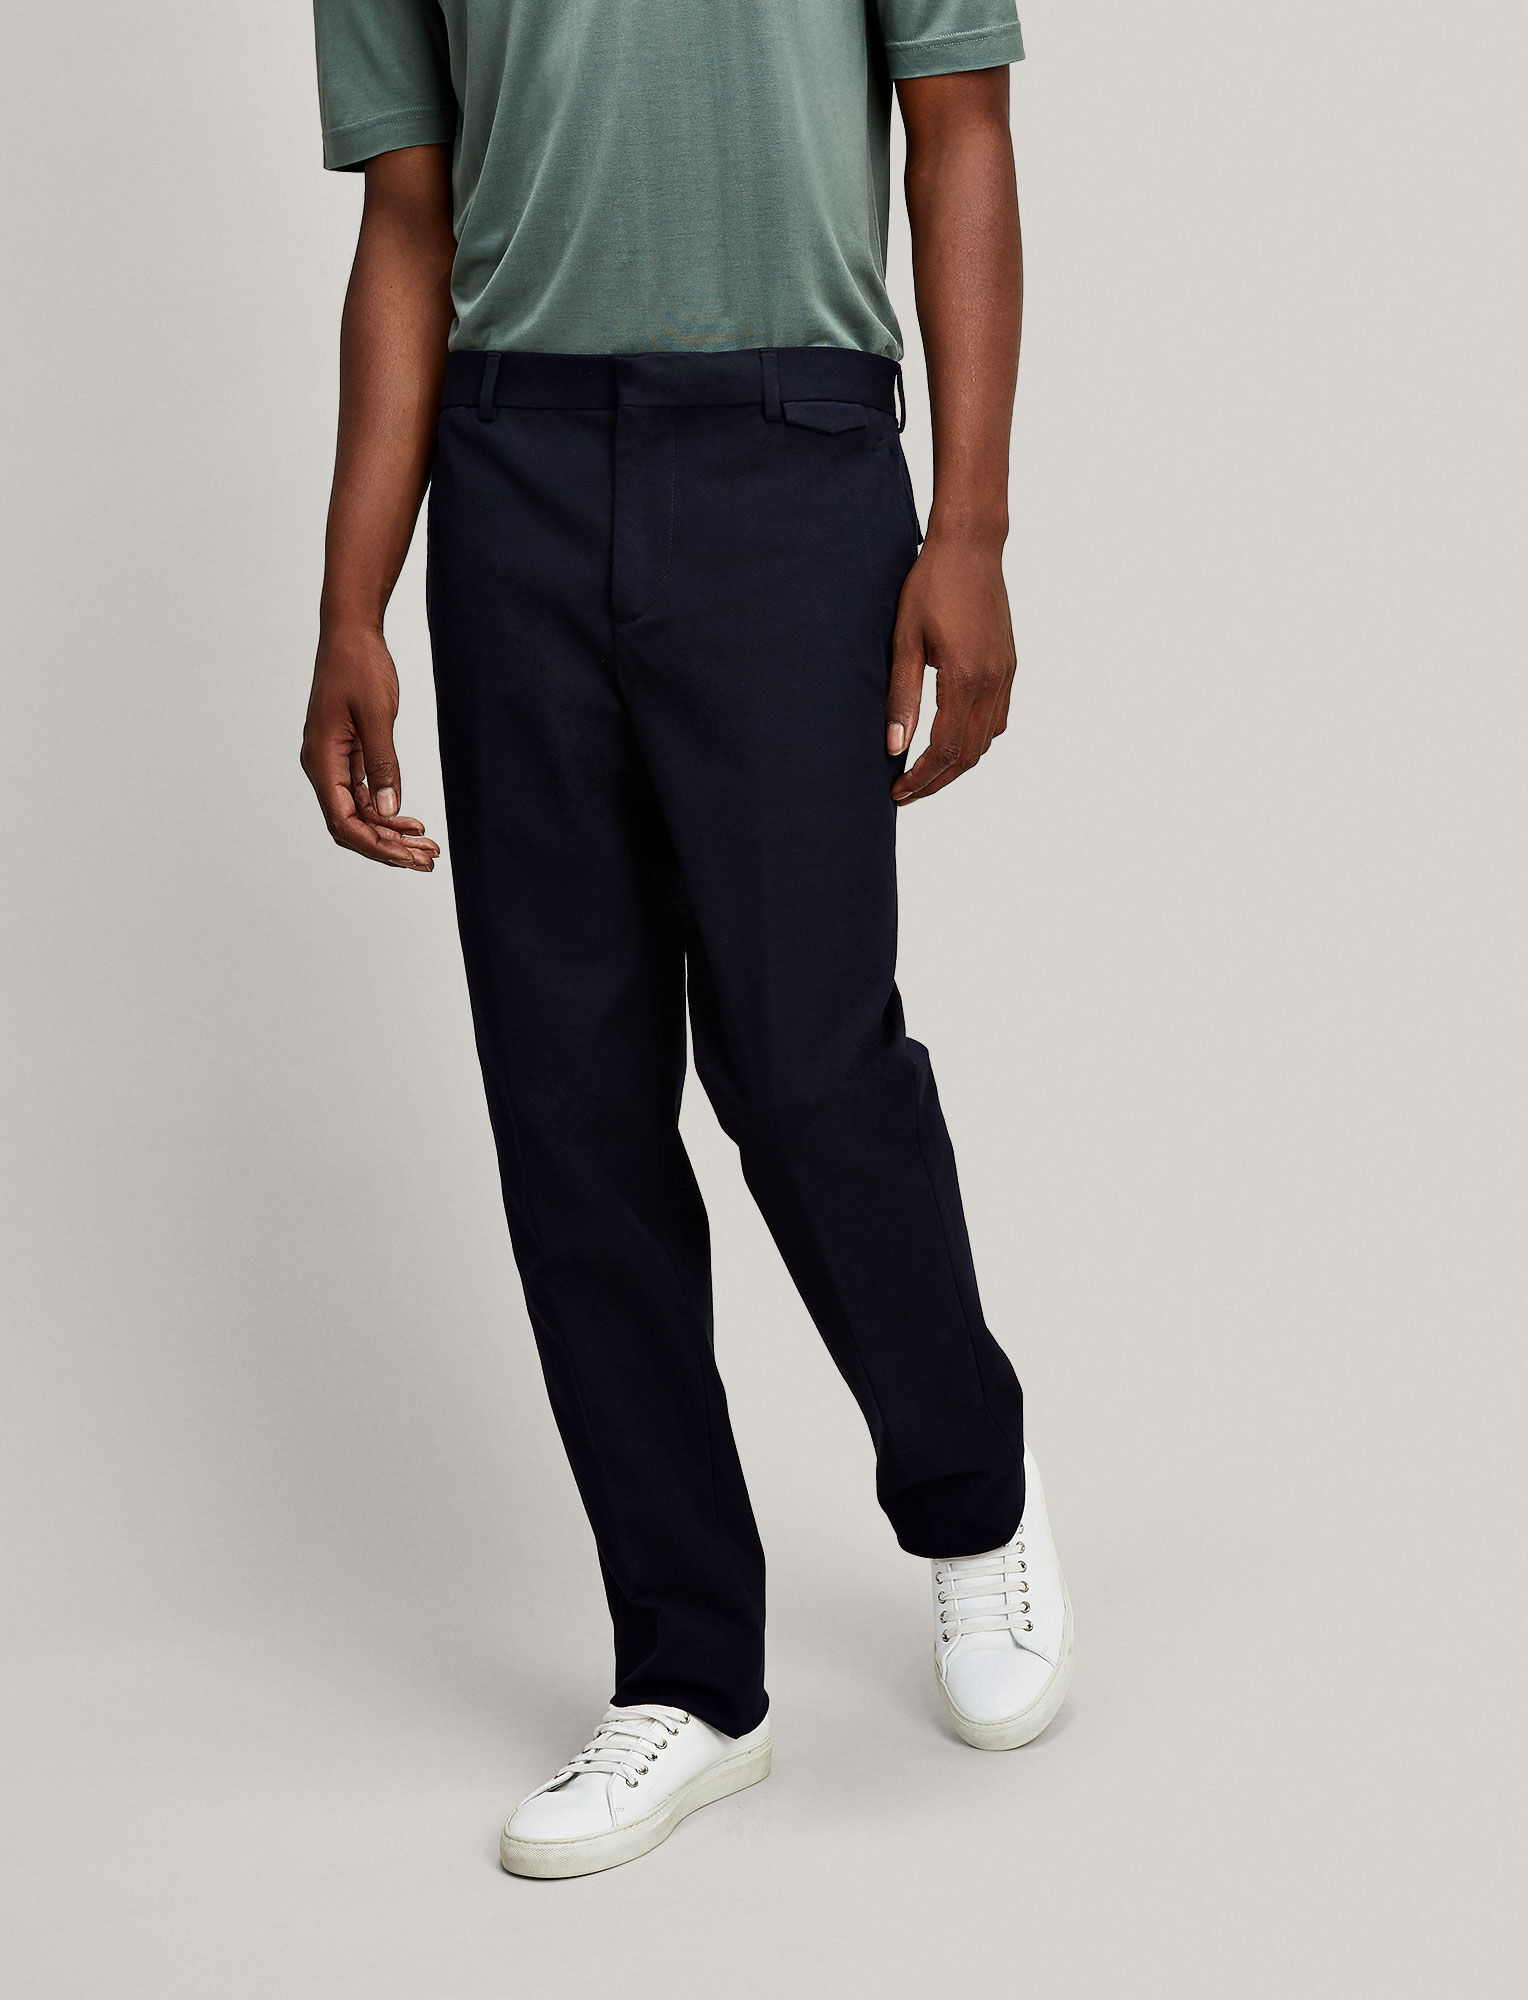 Joseph, Emmanuel Gabardine Stretch Trousers, in NAVY